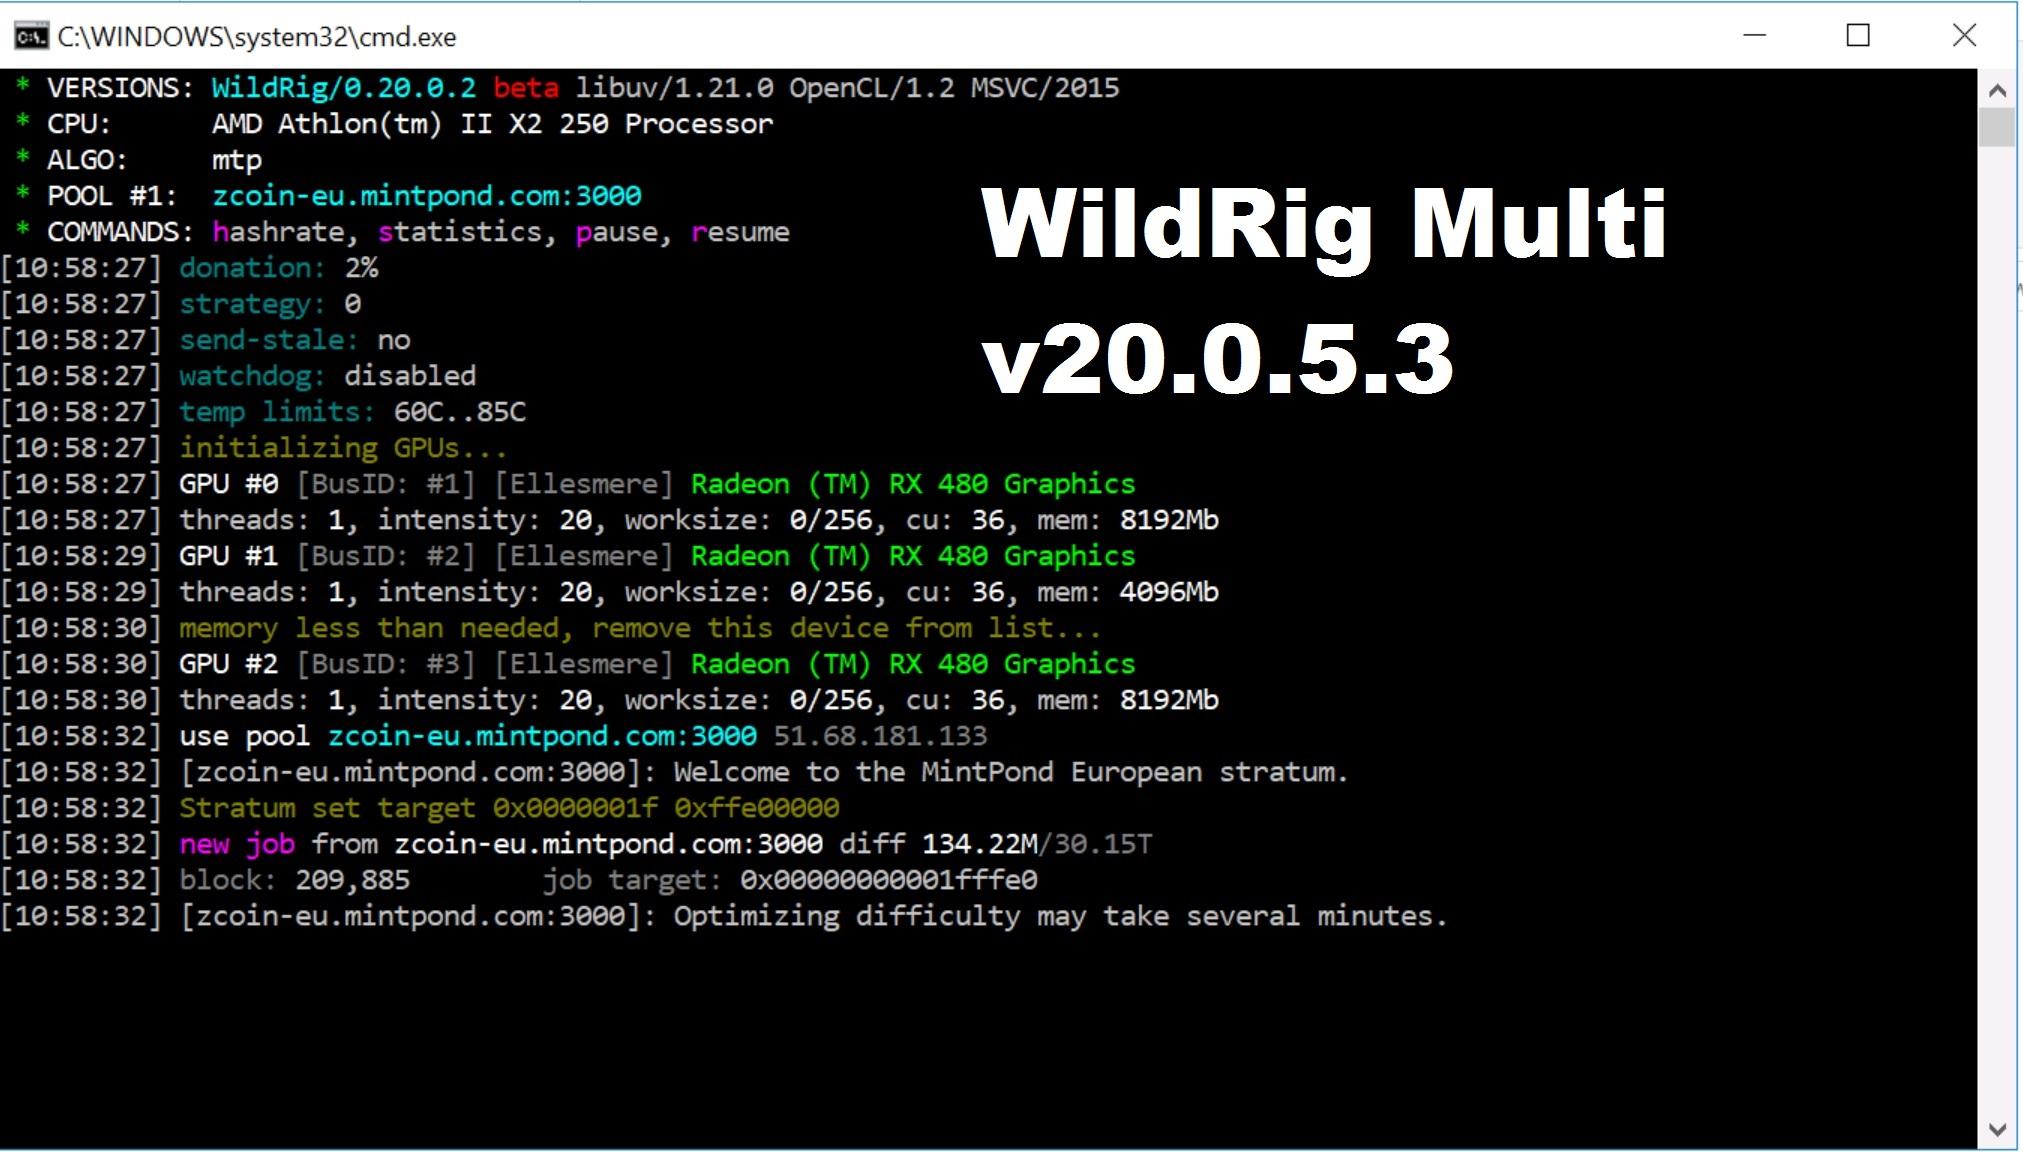 WildRig Multi 0.20.5.3 - Добавлен x17r (Download for Windows 7/10)